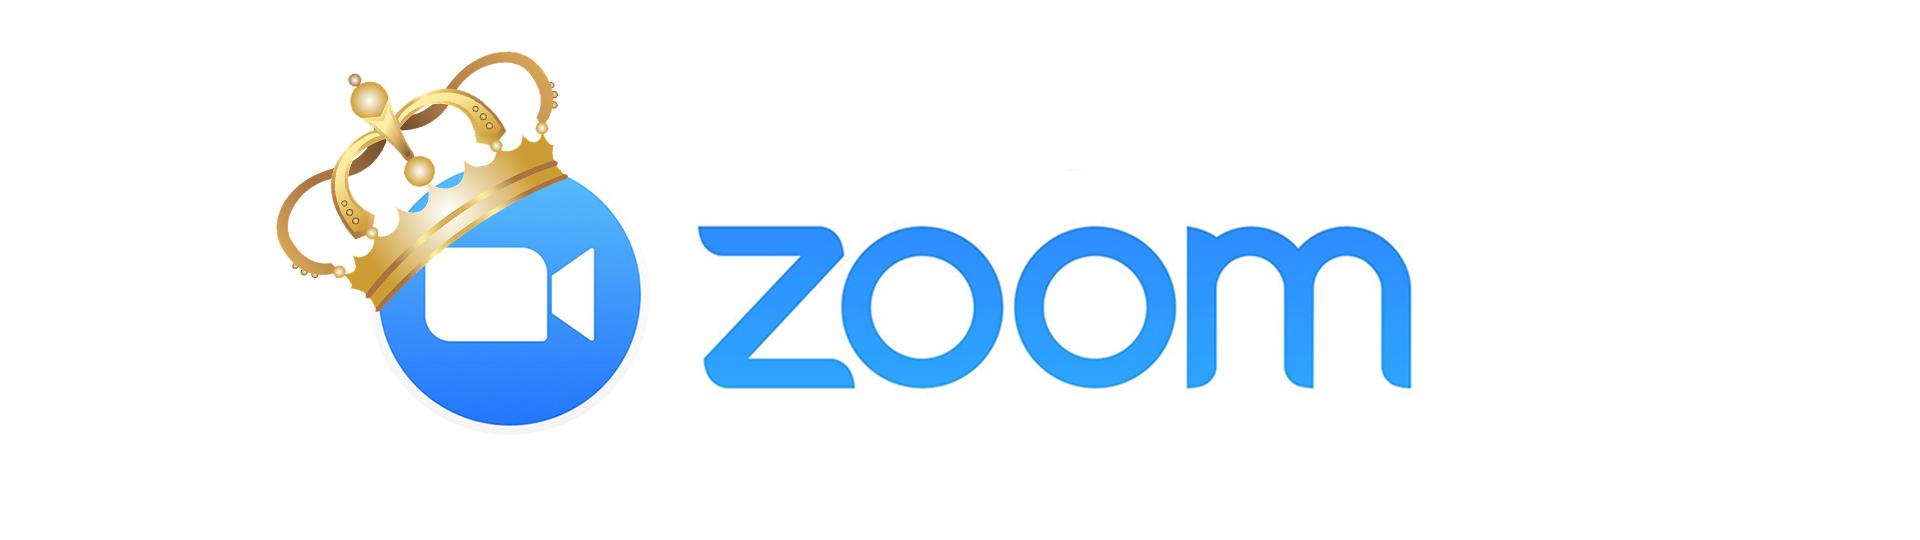 Zoom Logo Wearing a Crown